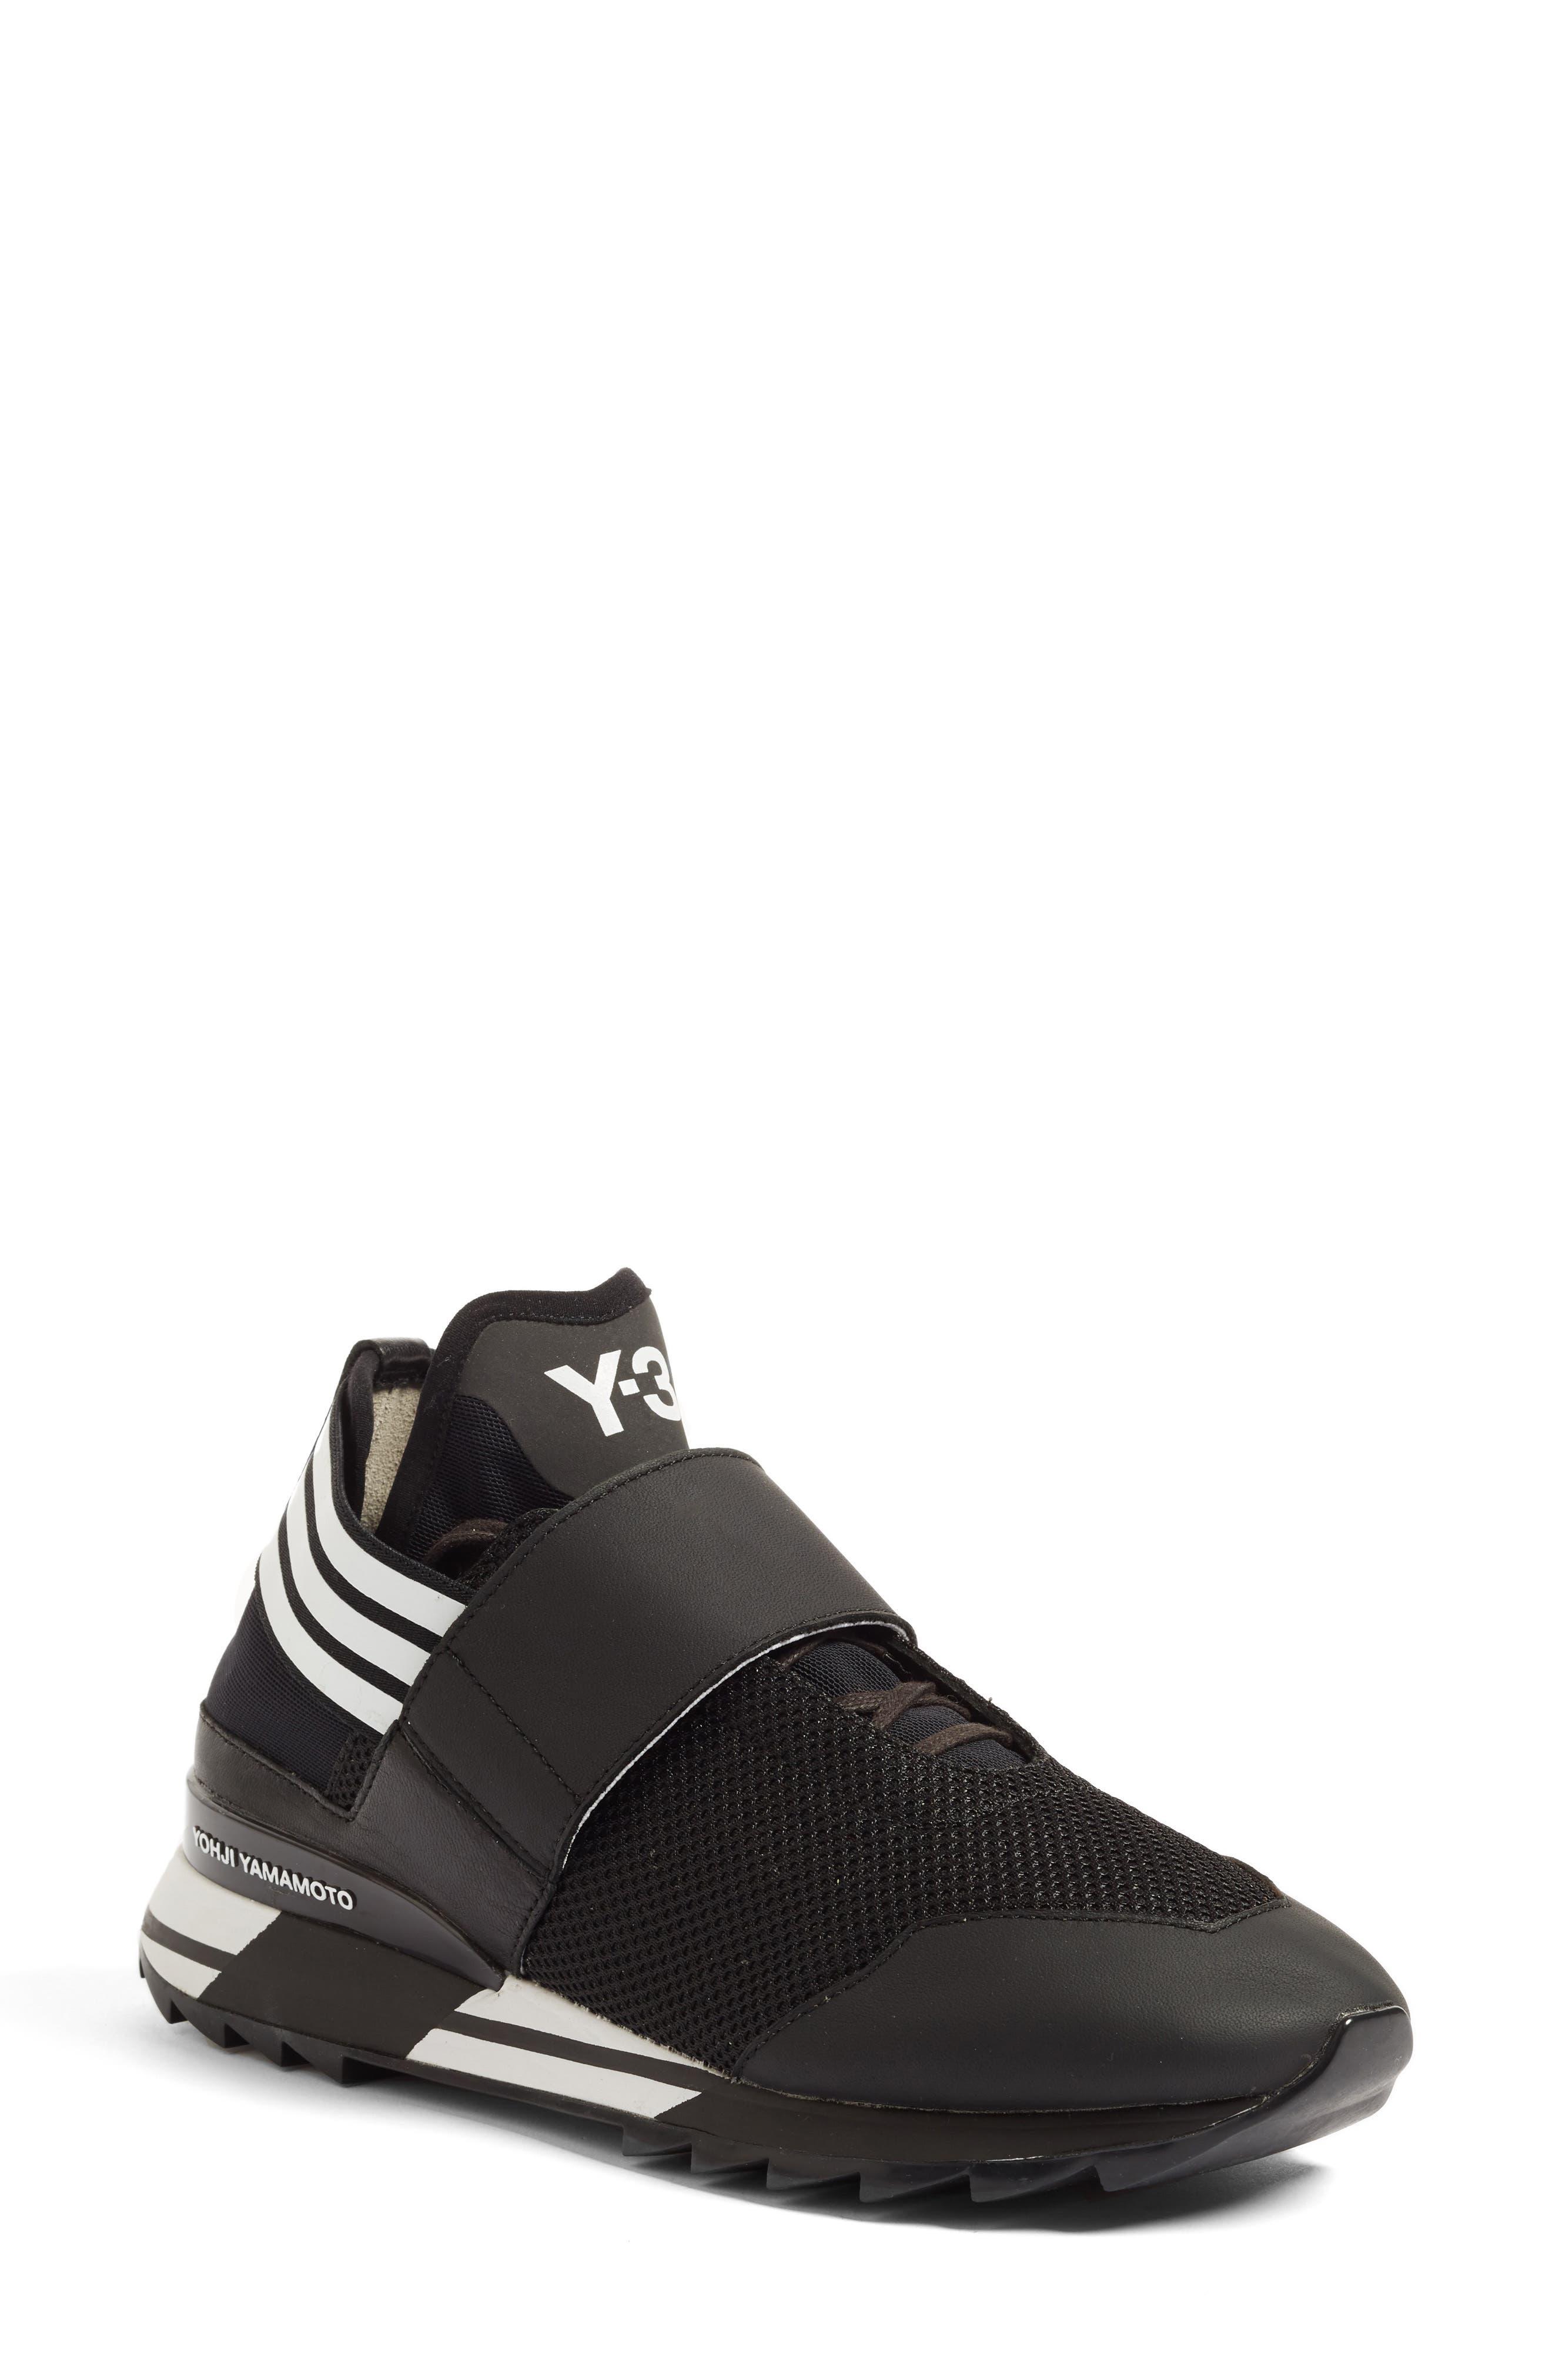 Y-3 Atira Sneaker (Women)